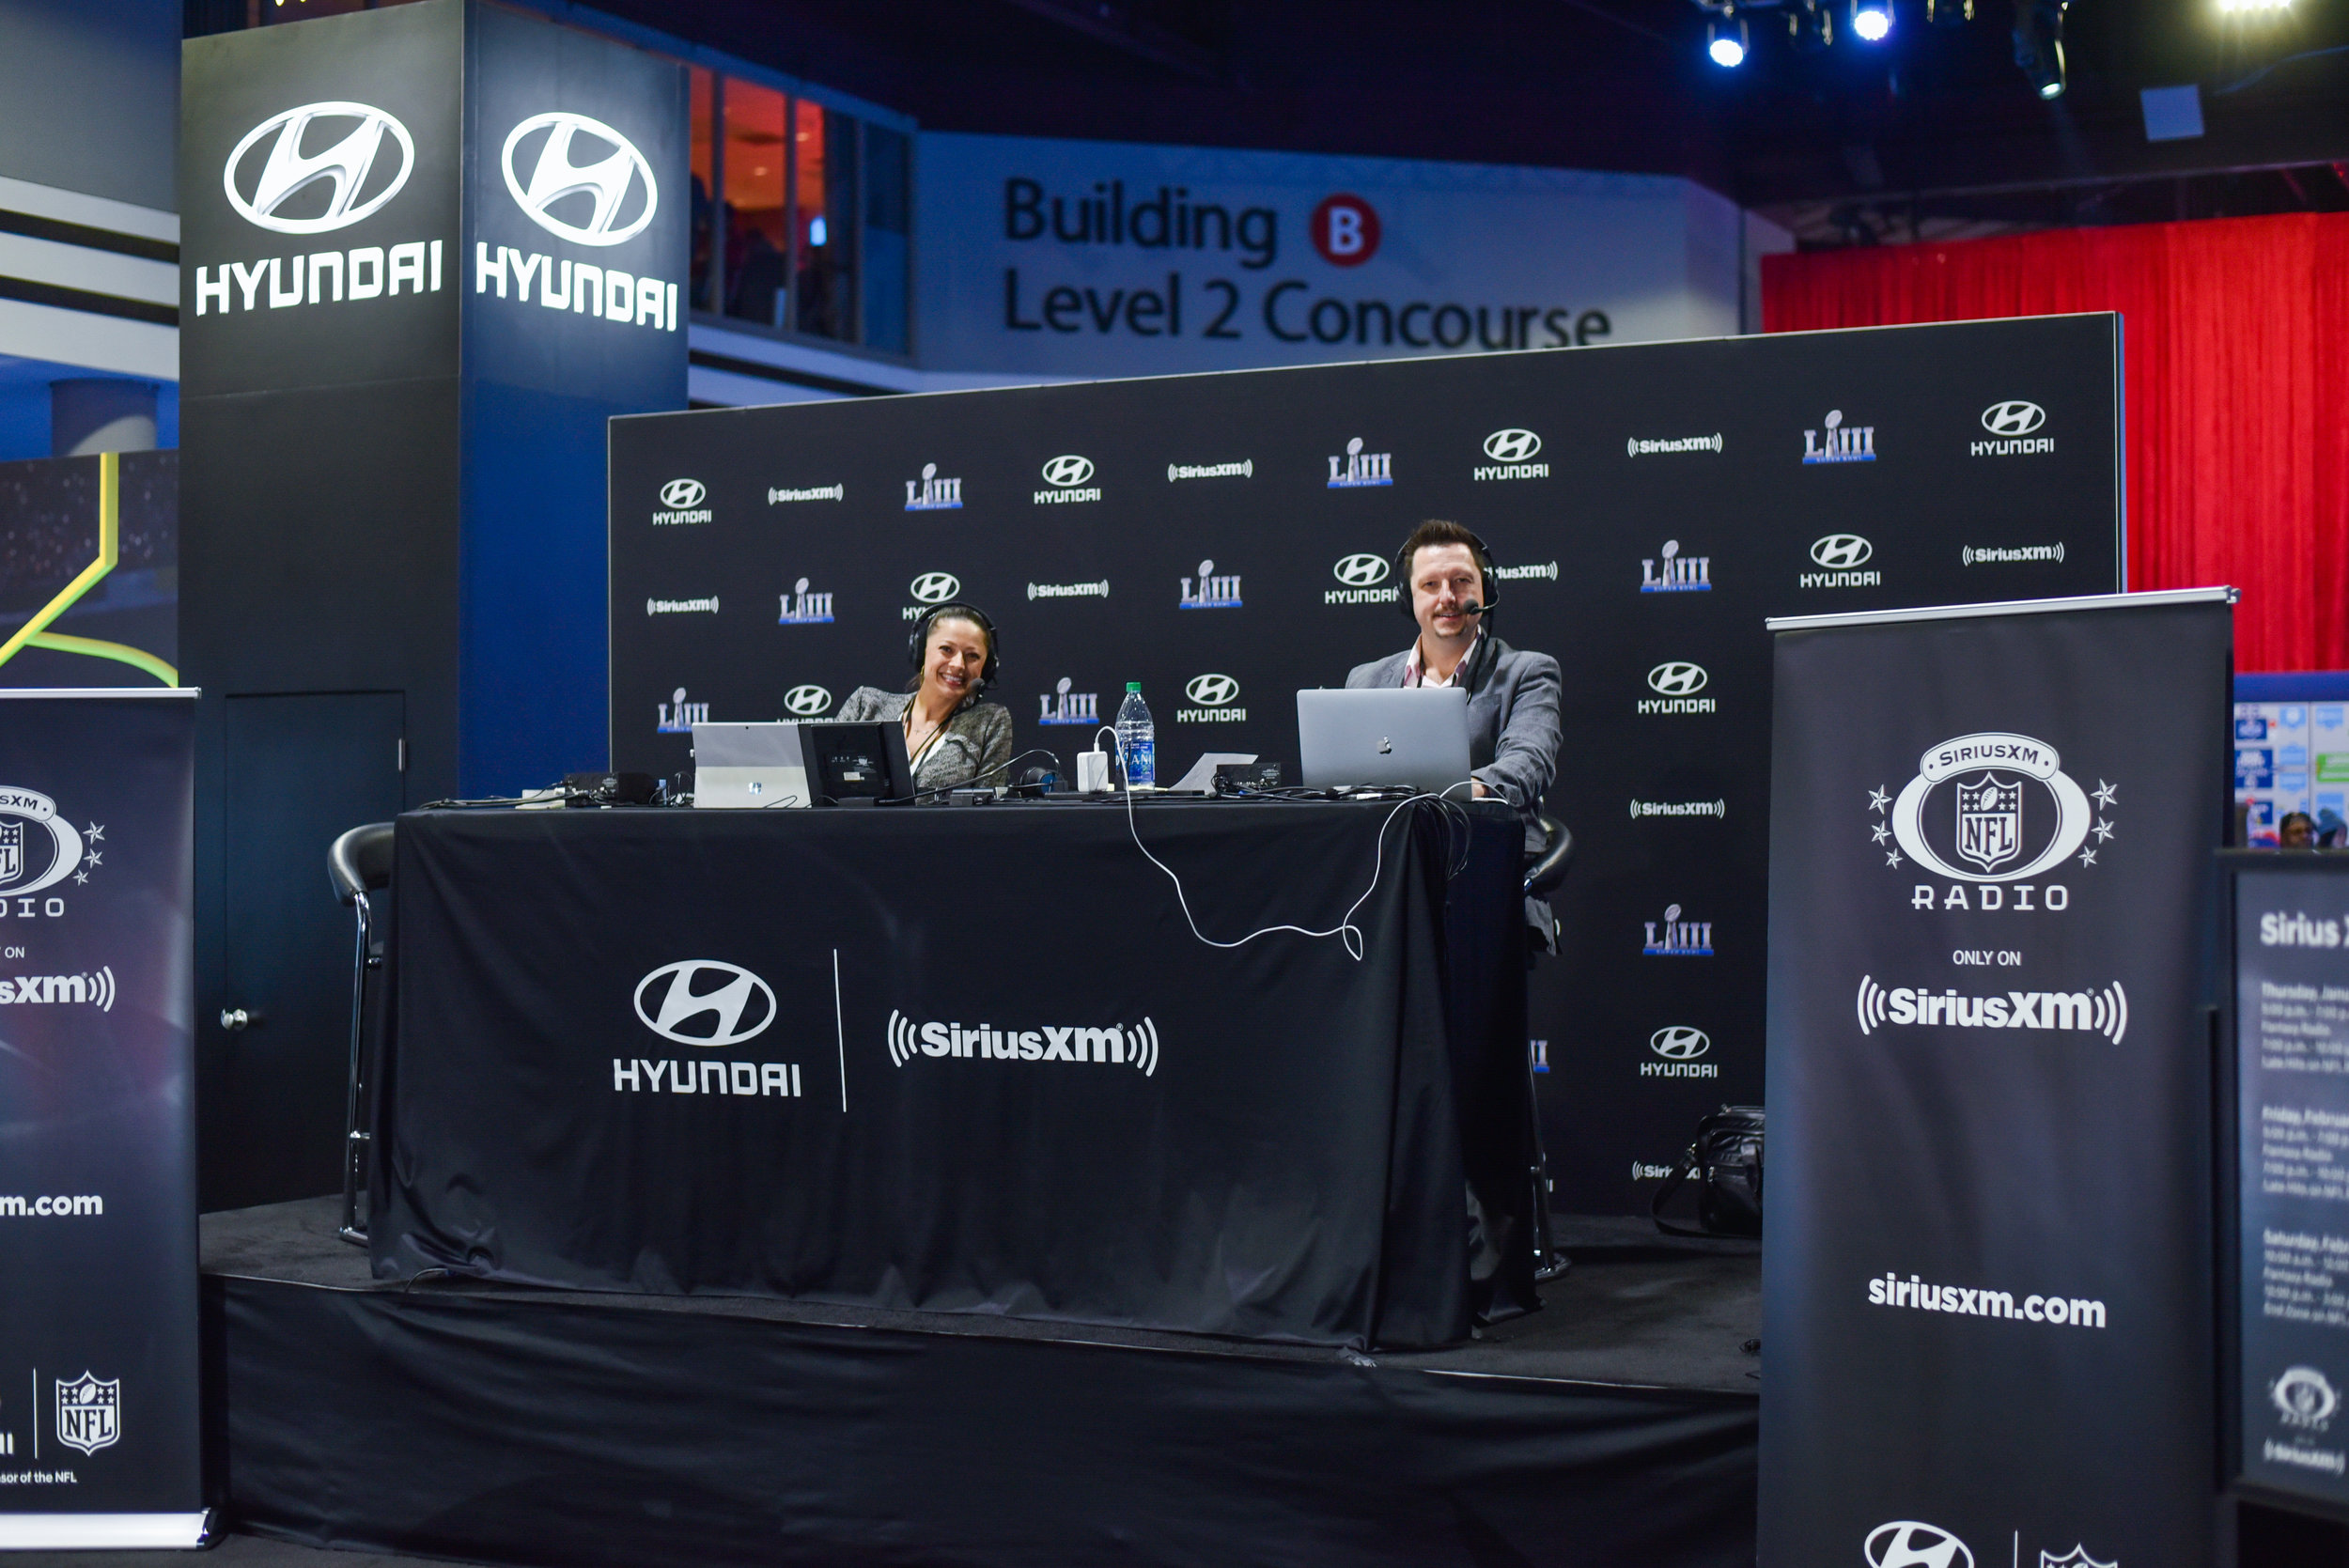 OHelloMedia - Advantage International- Hyundai @ SB Experience-Top Selects-3-6.jpg